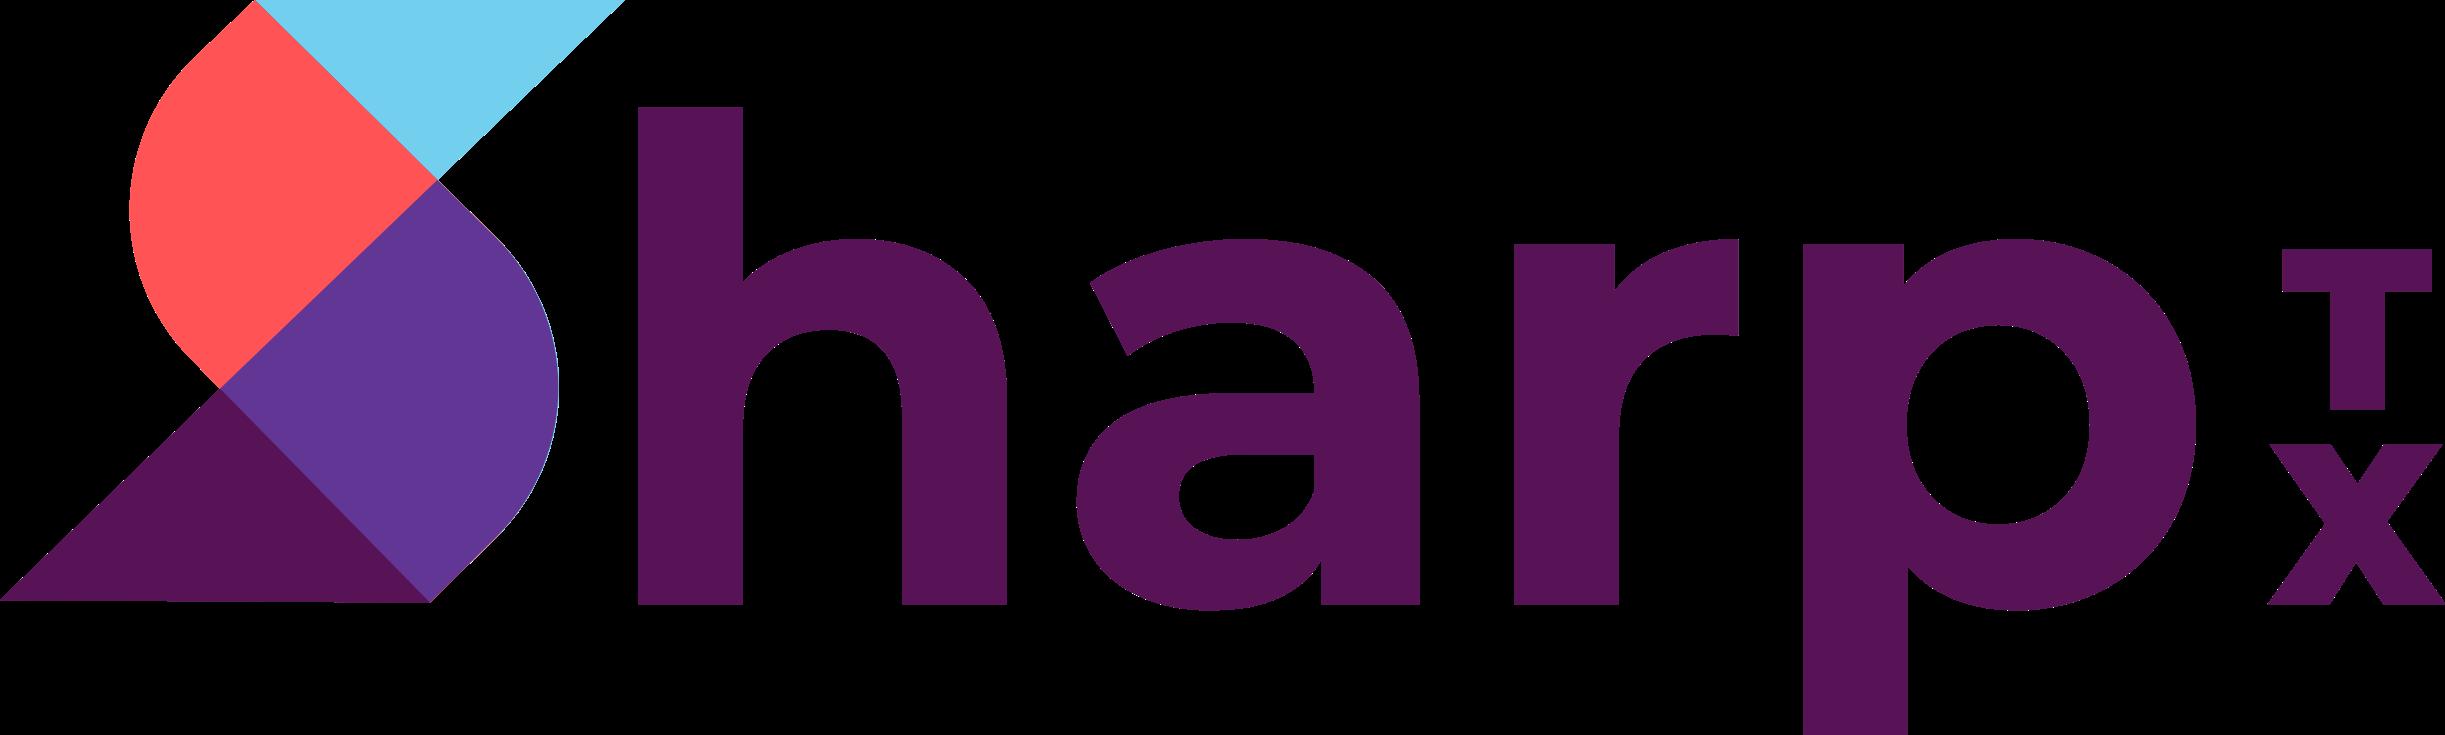 sharptx-logo